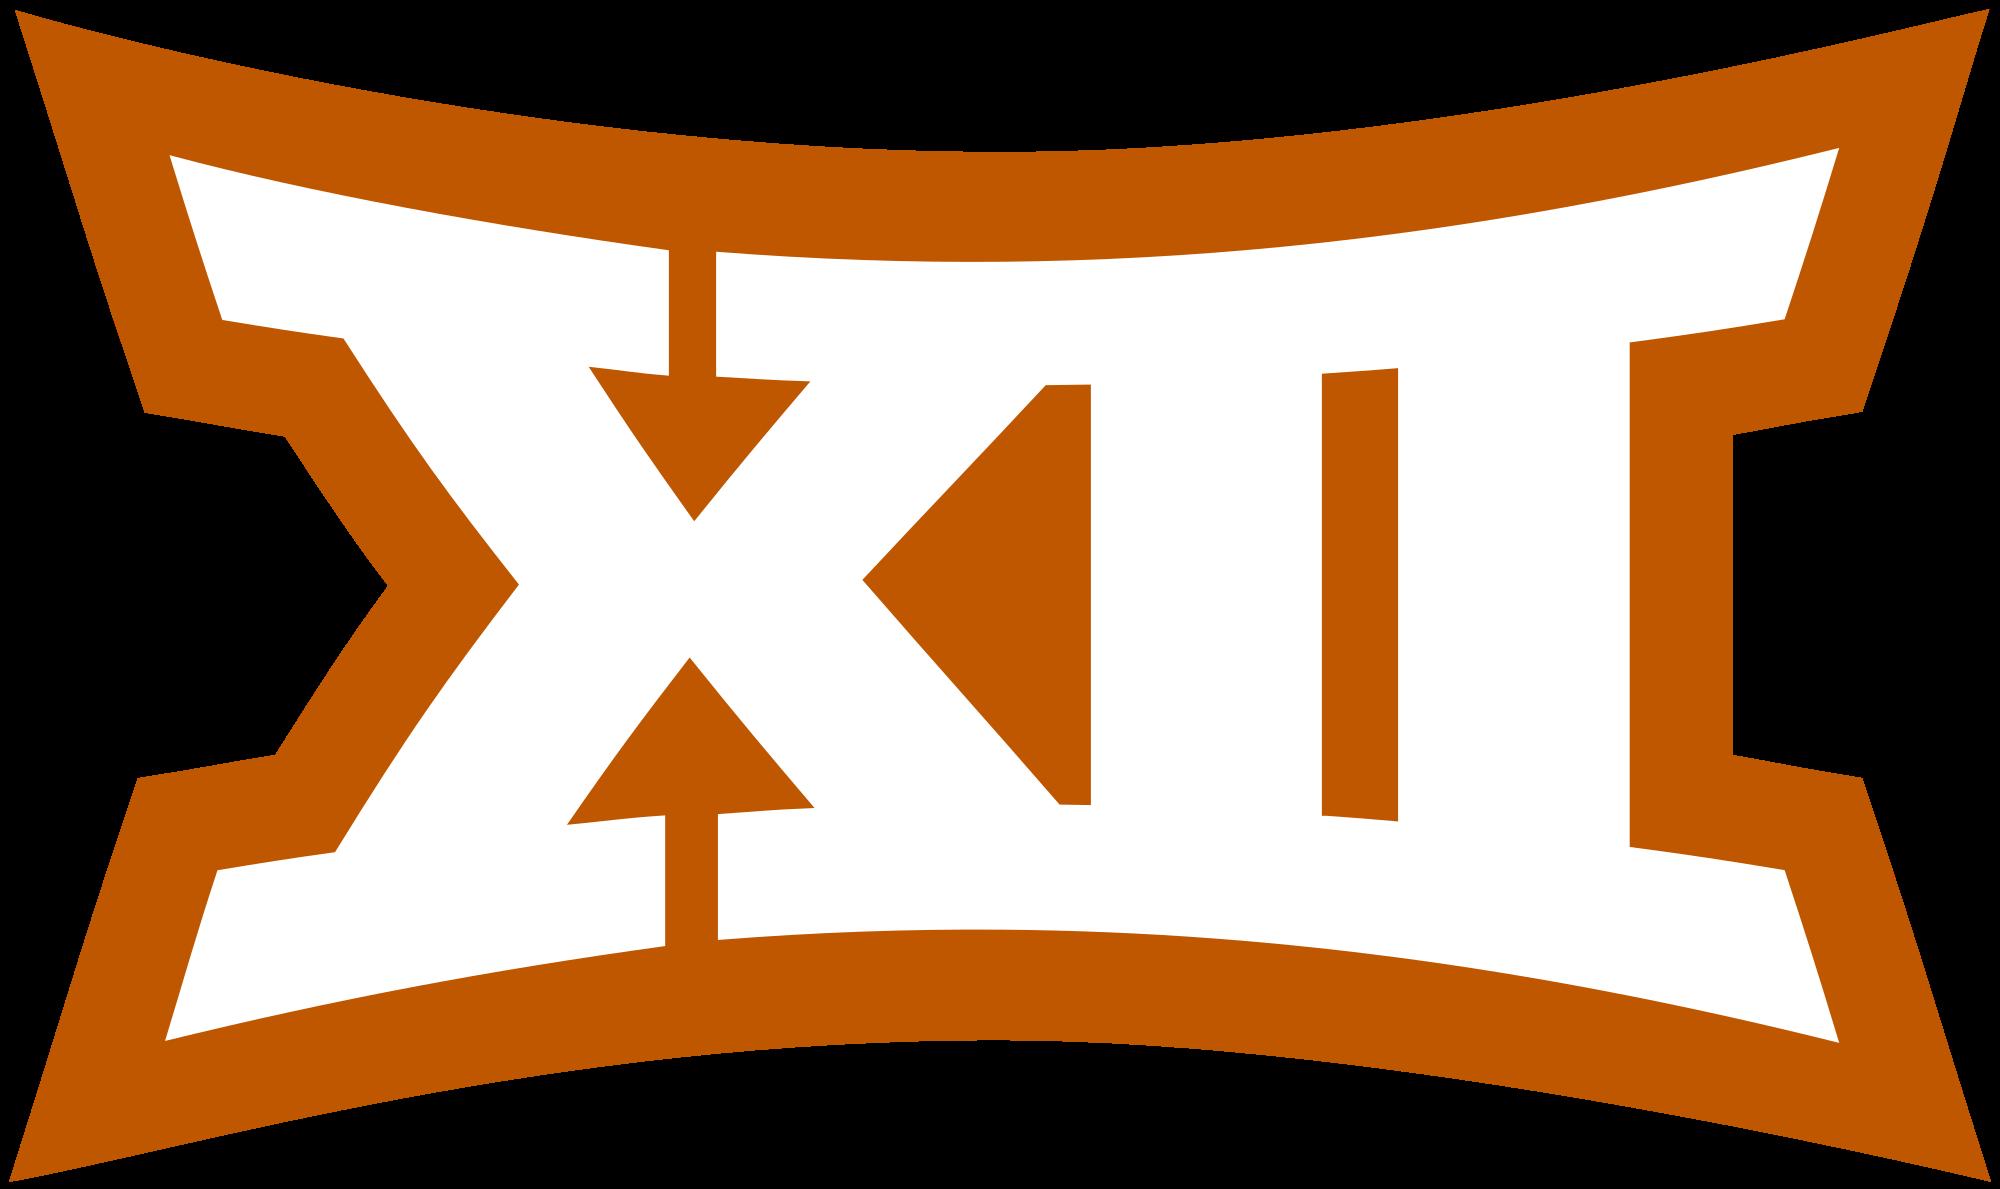 Longhorn clipart color. File big logo in